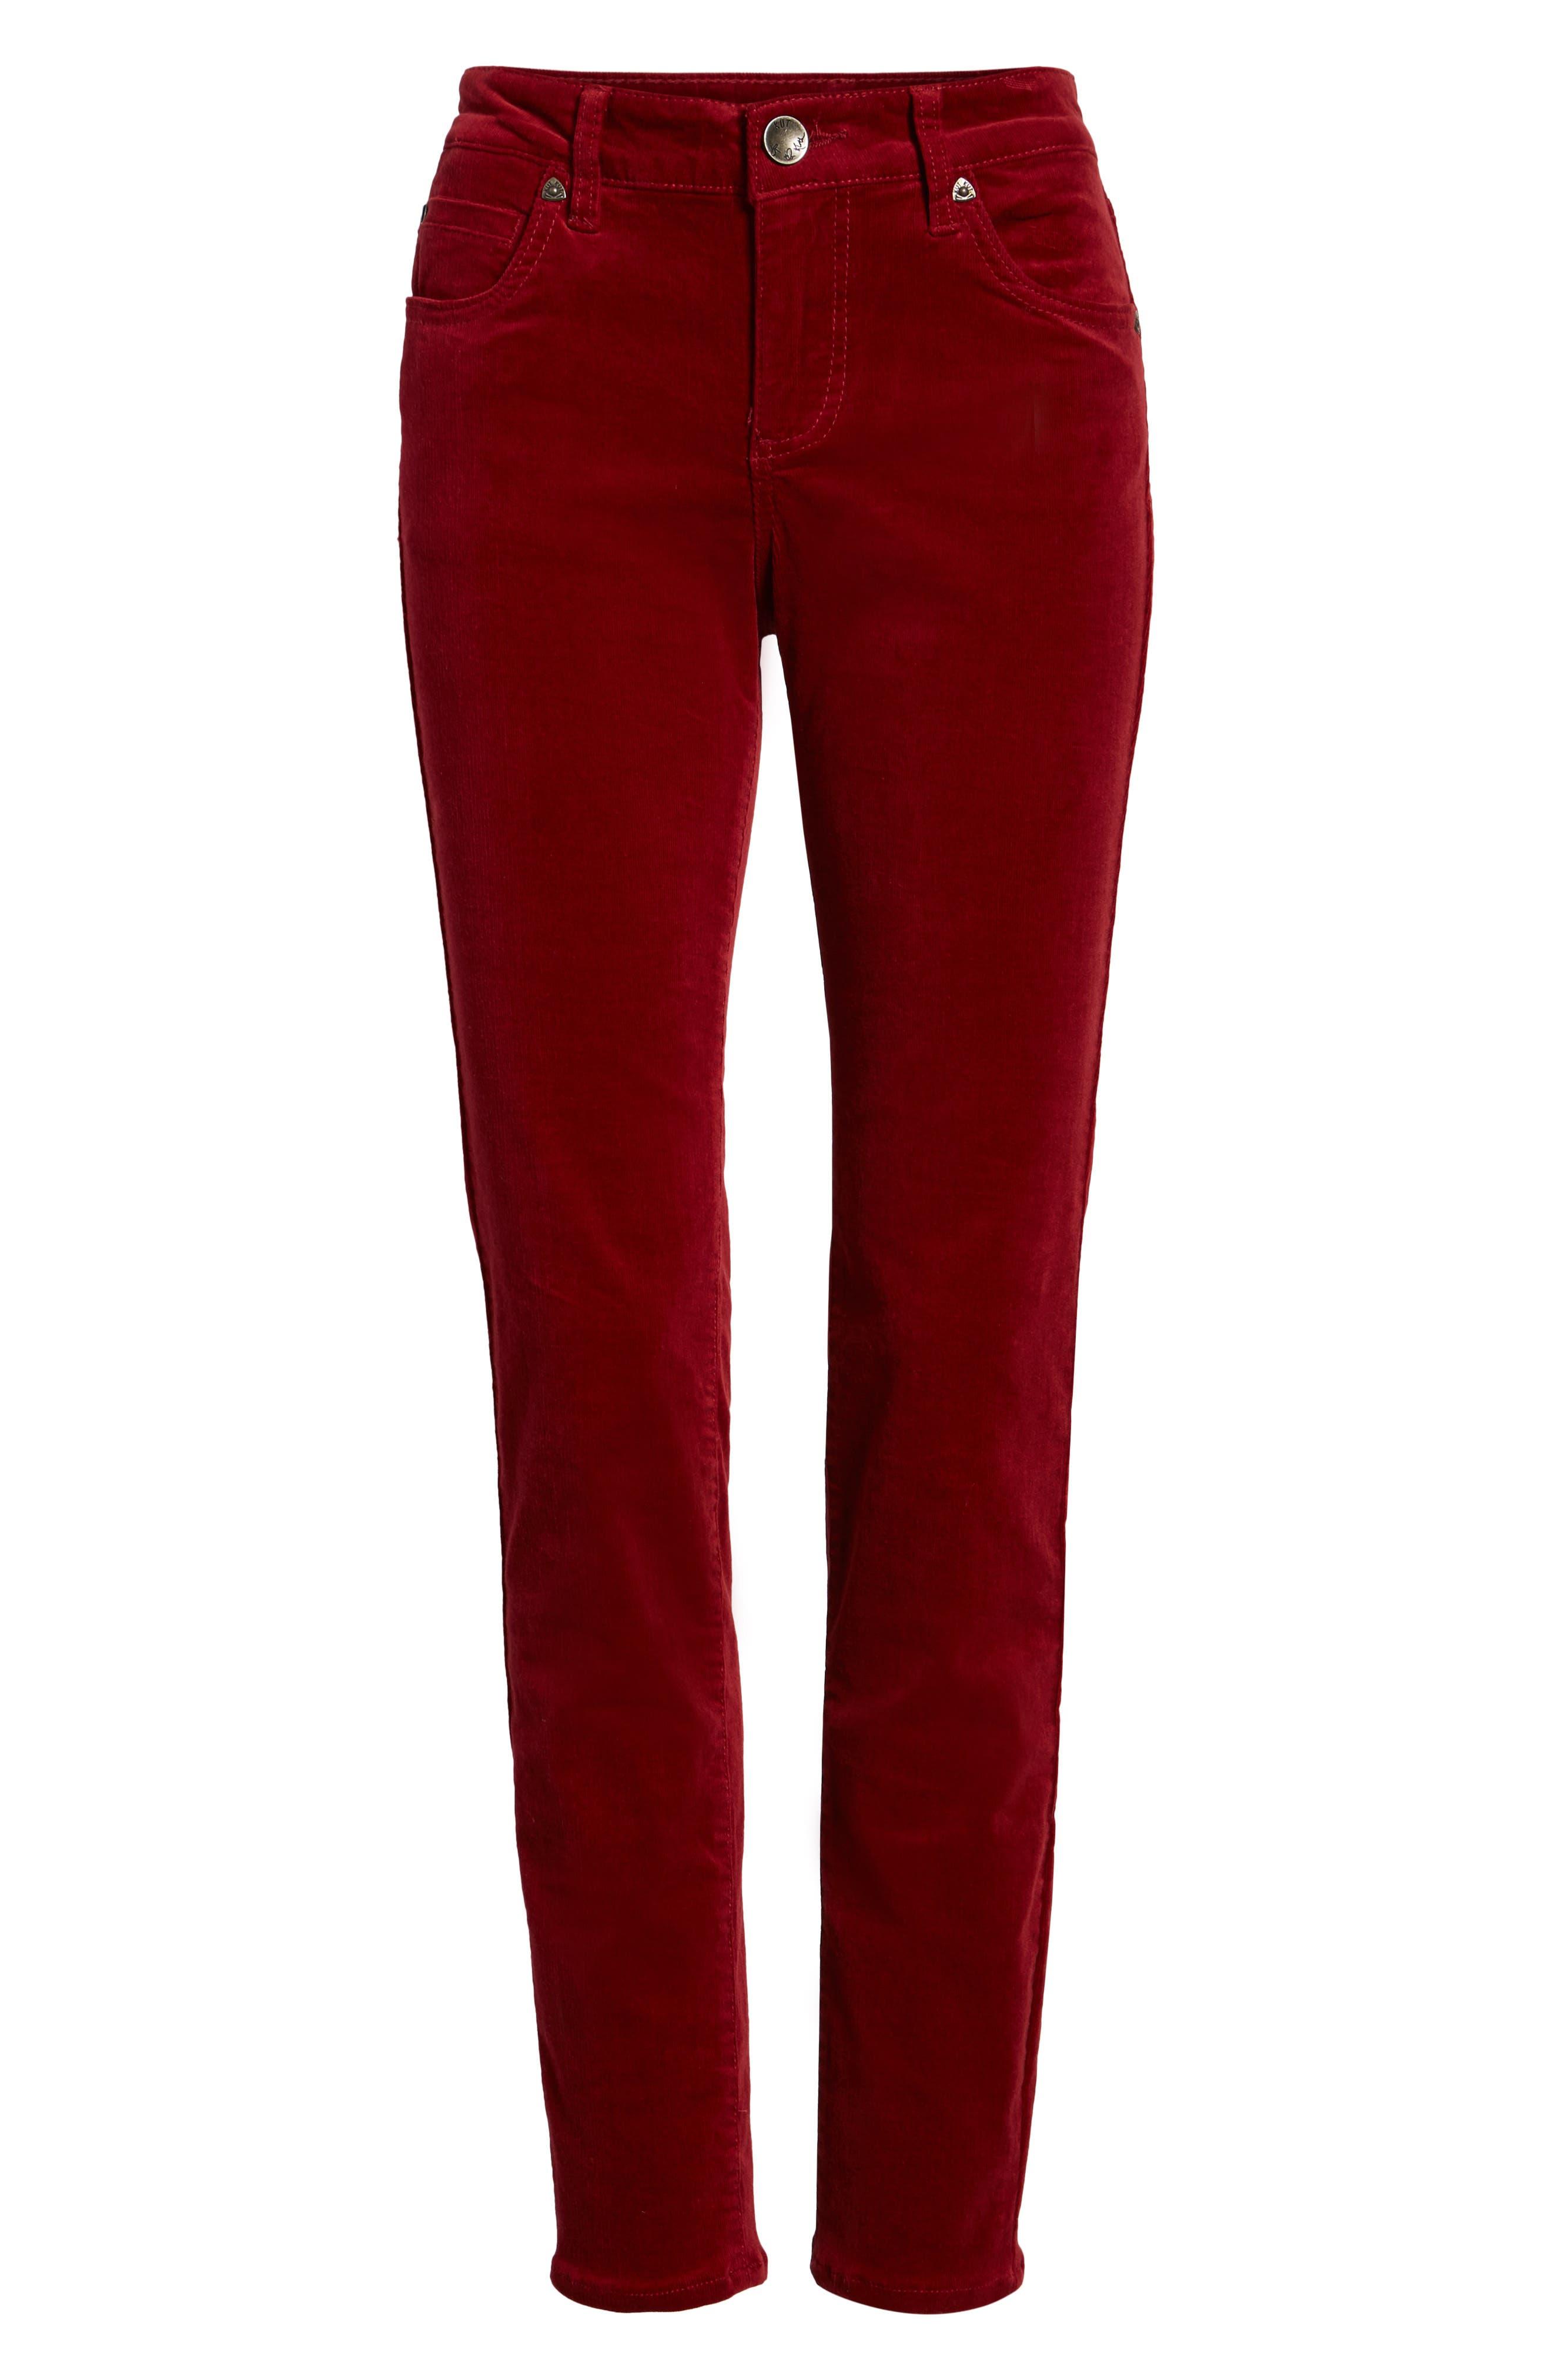 'Diana' Stretch Corduroy Skinny Pants,                             Alternate thumbnail 268, color,